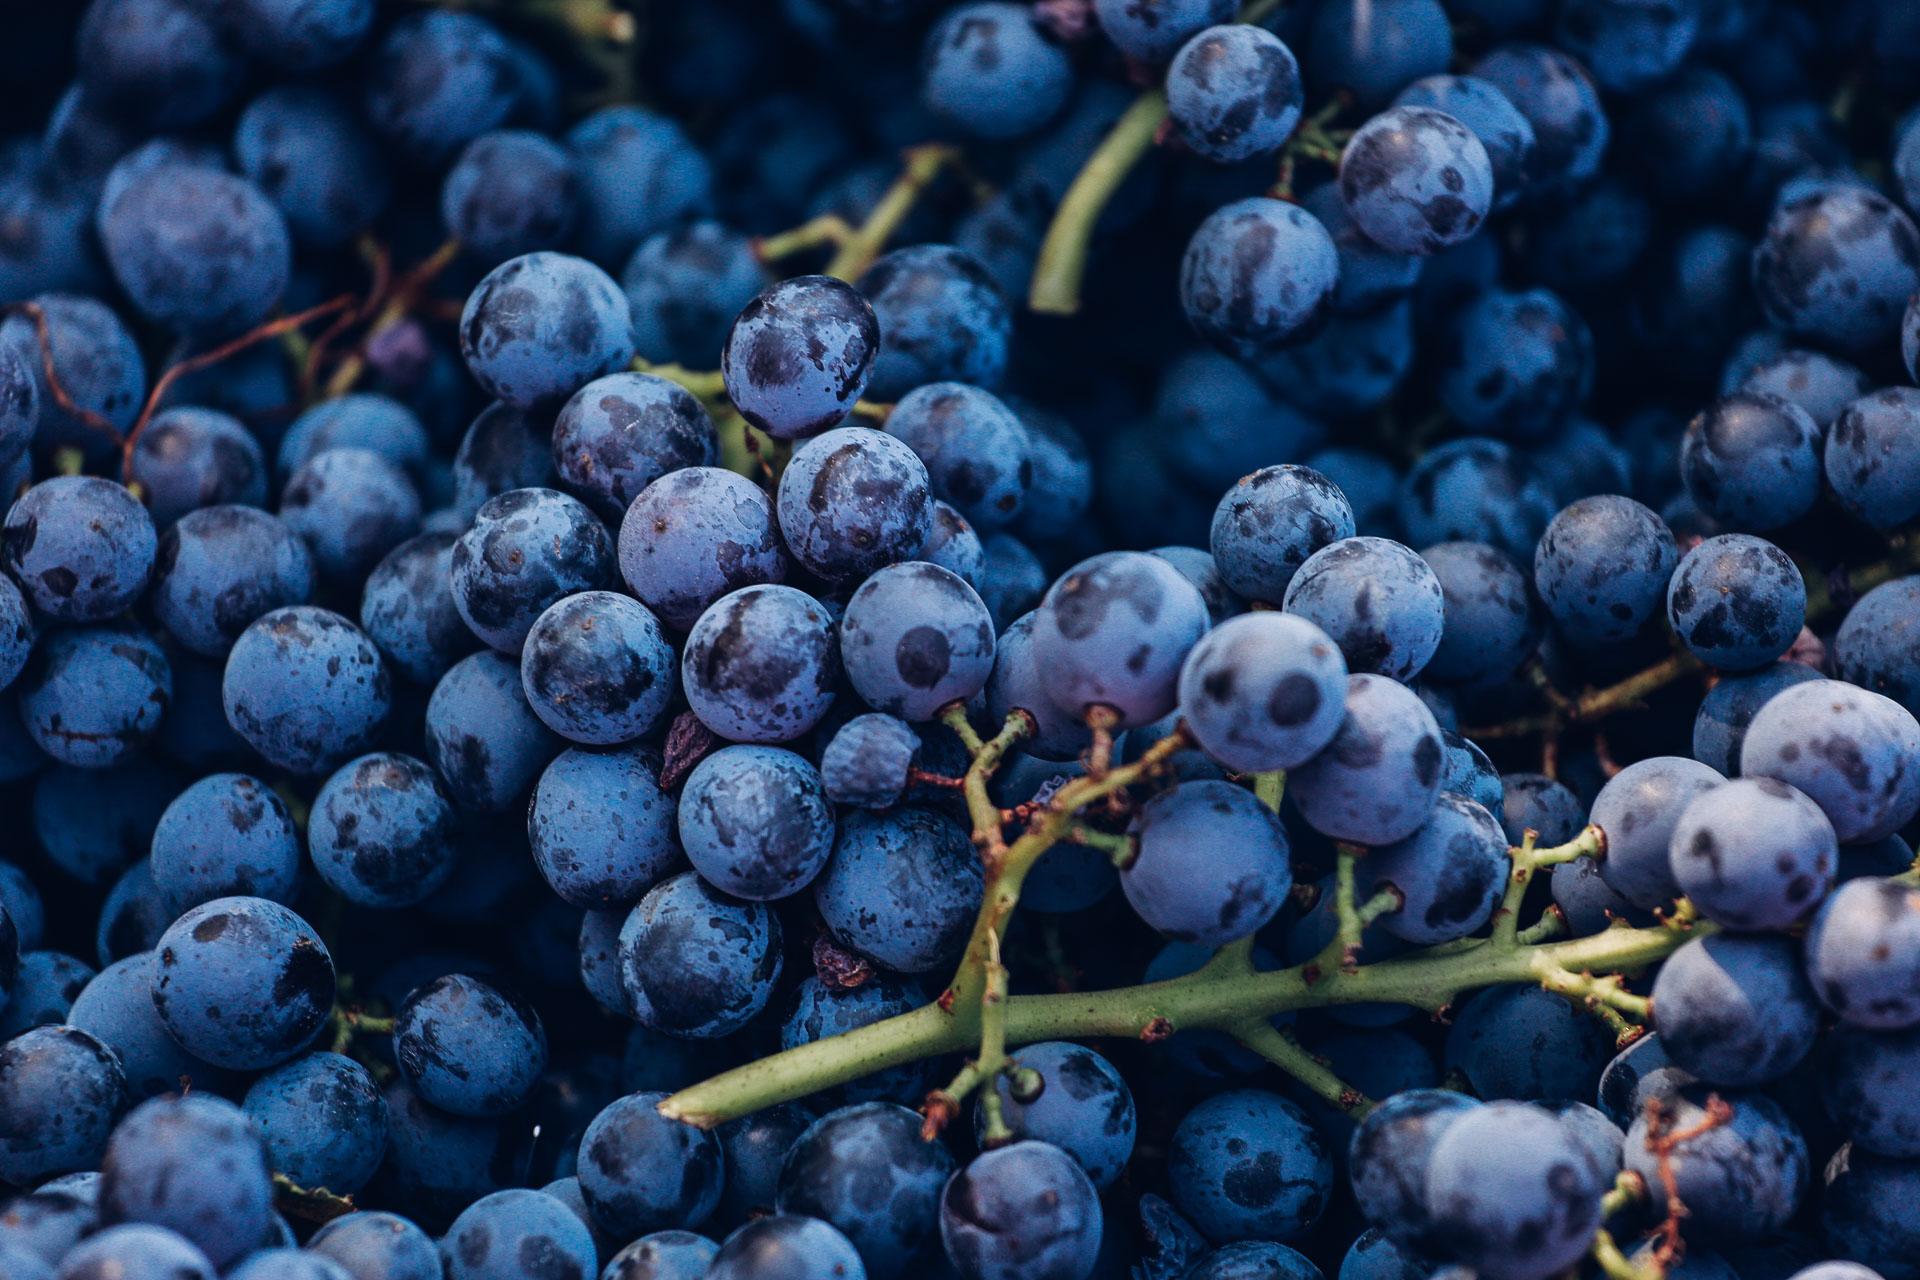 021-Sauro-maule-wineyards-organic-harvest-2016-_RUI7317_p_Lr_web_HD